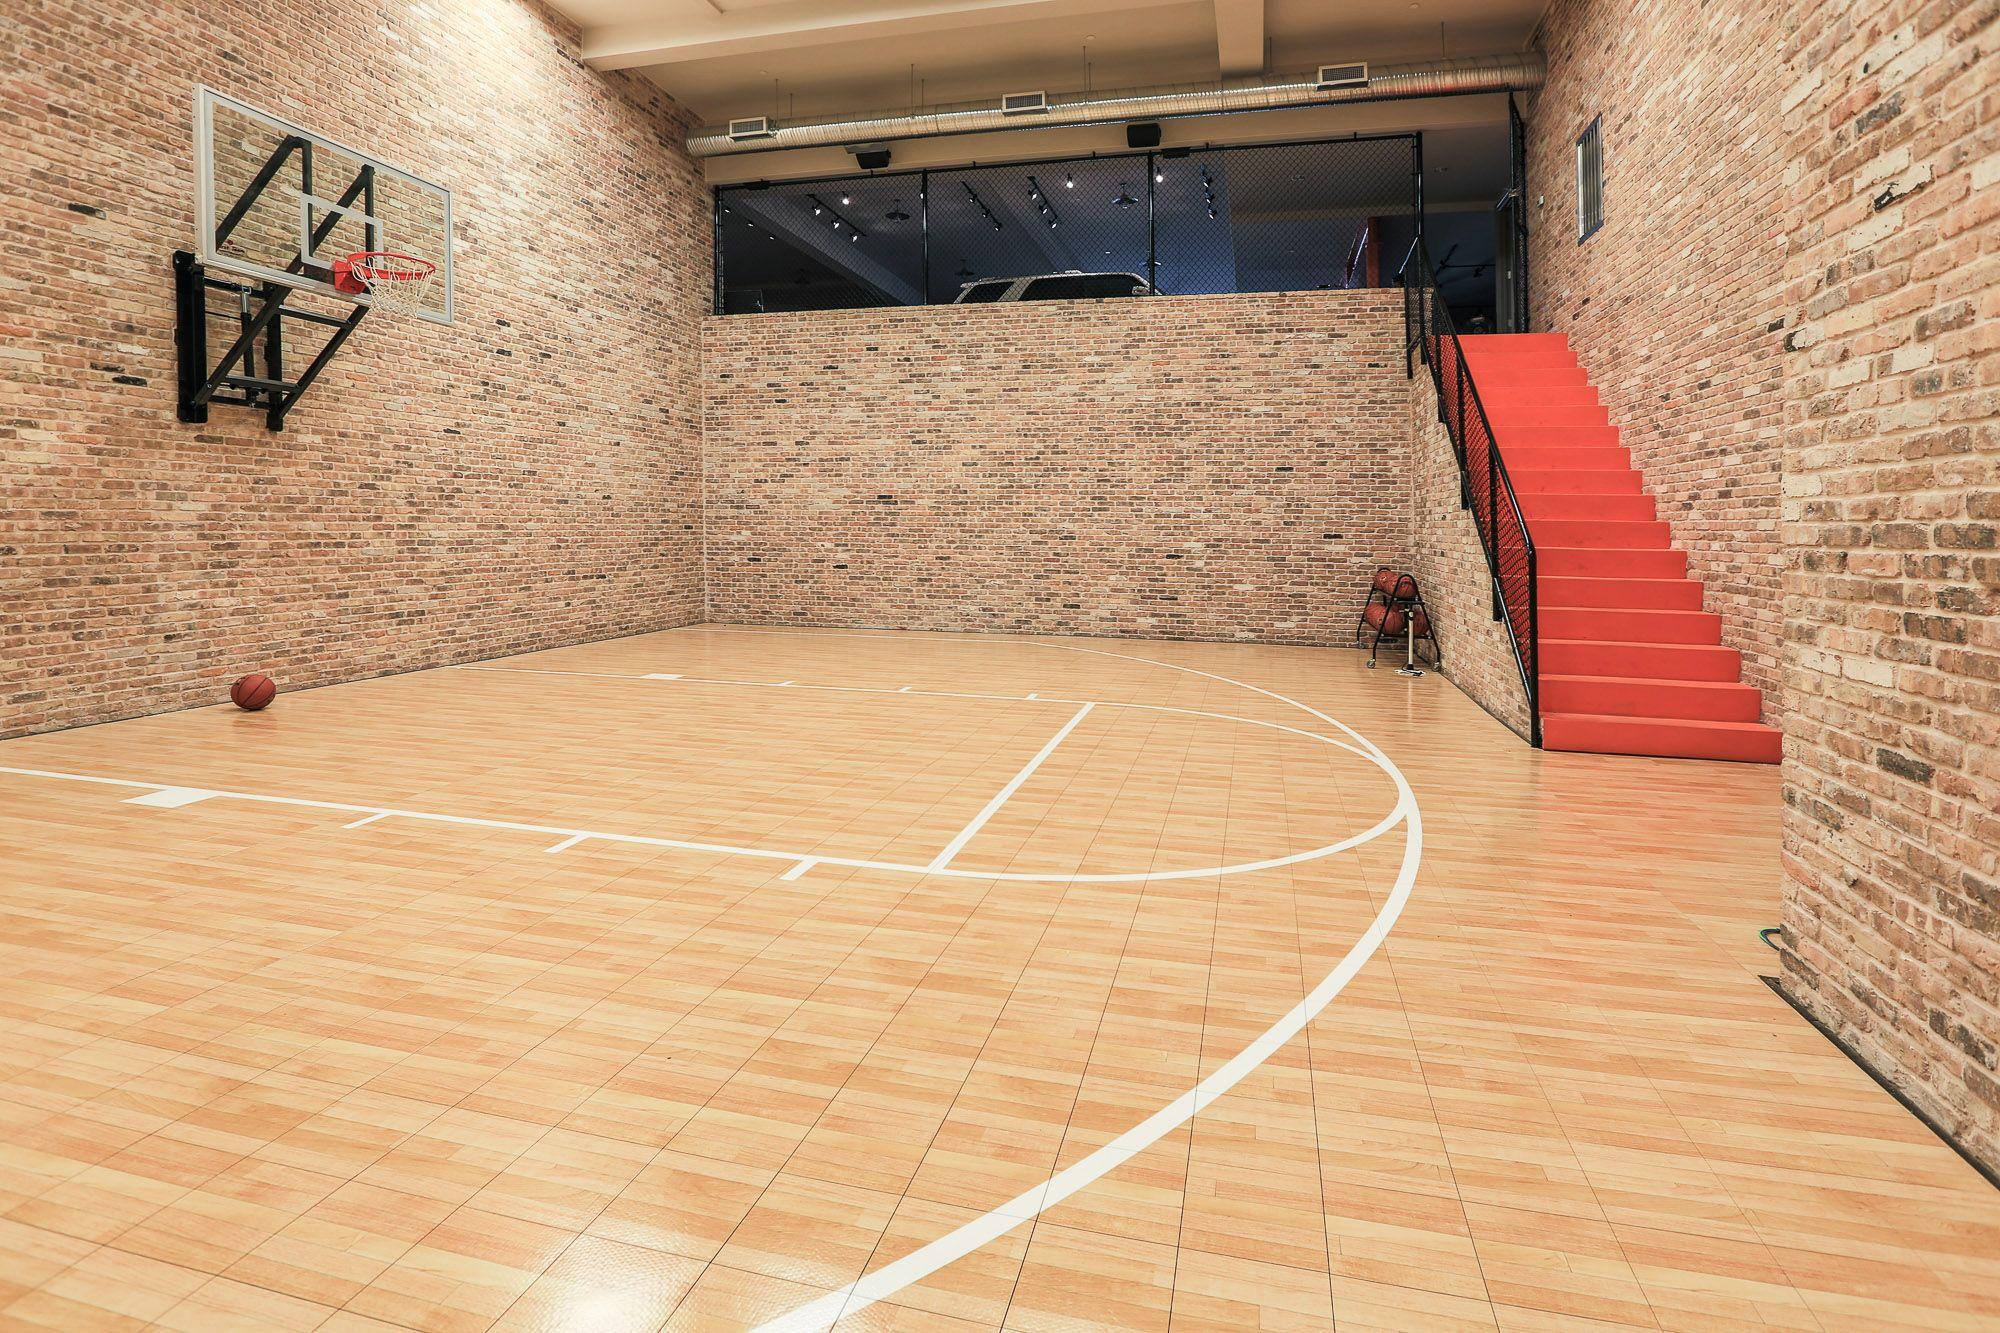 Basement basketball court nice use of stonework steps for Basement sport court